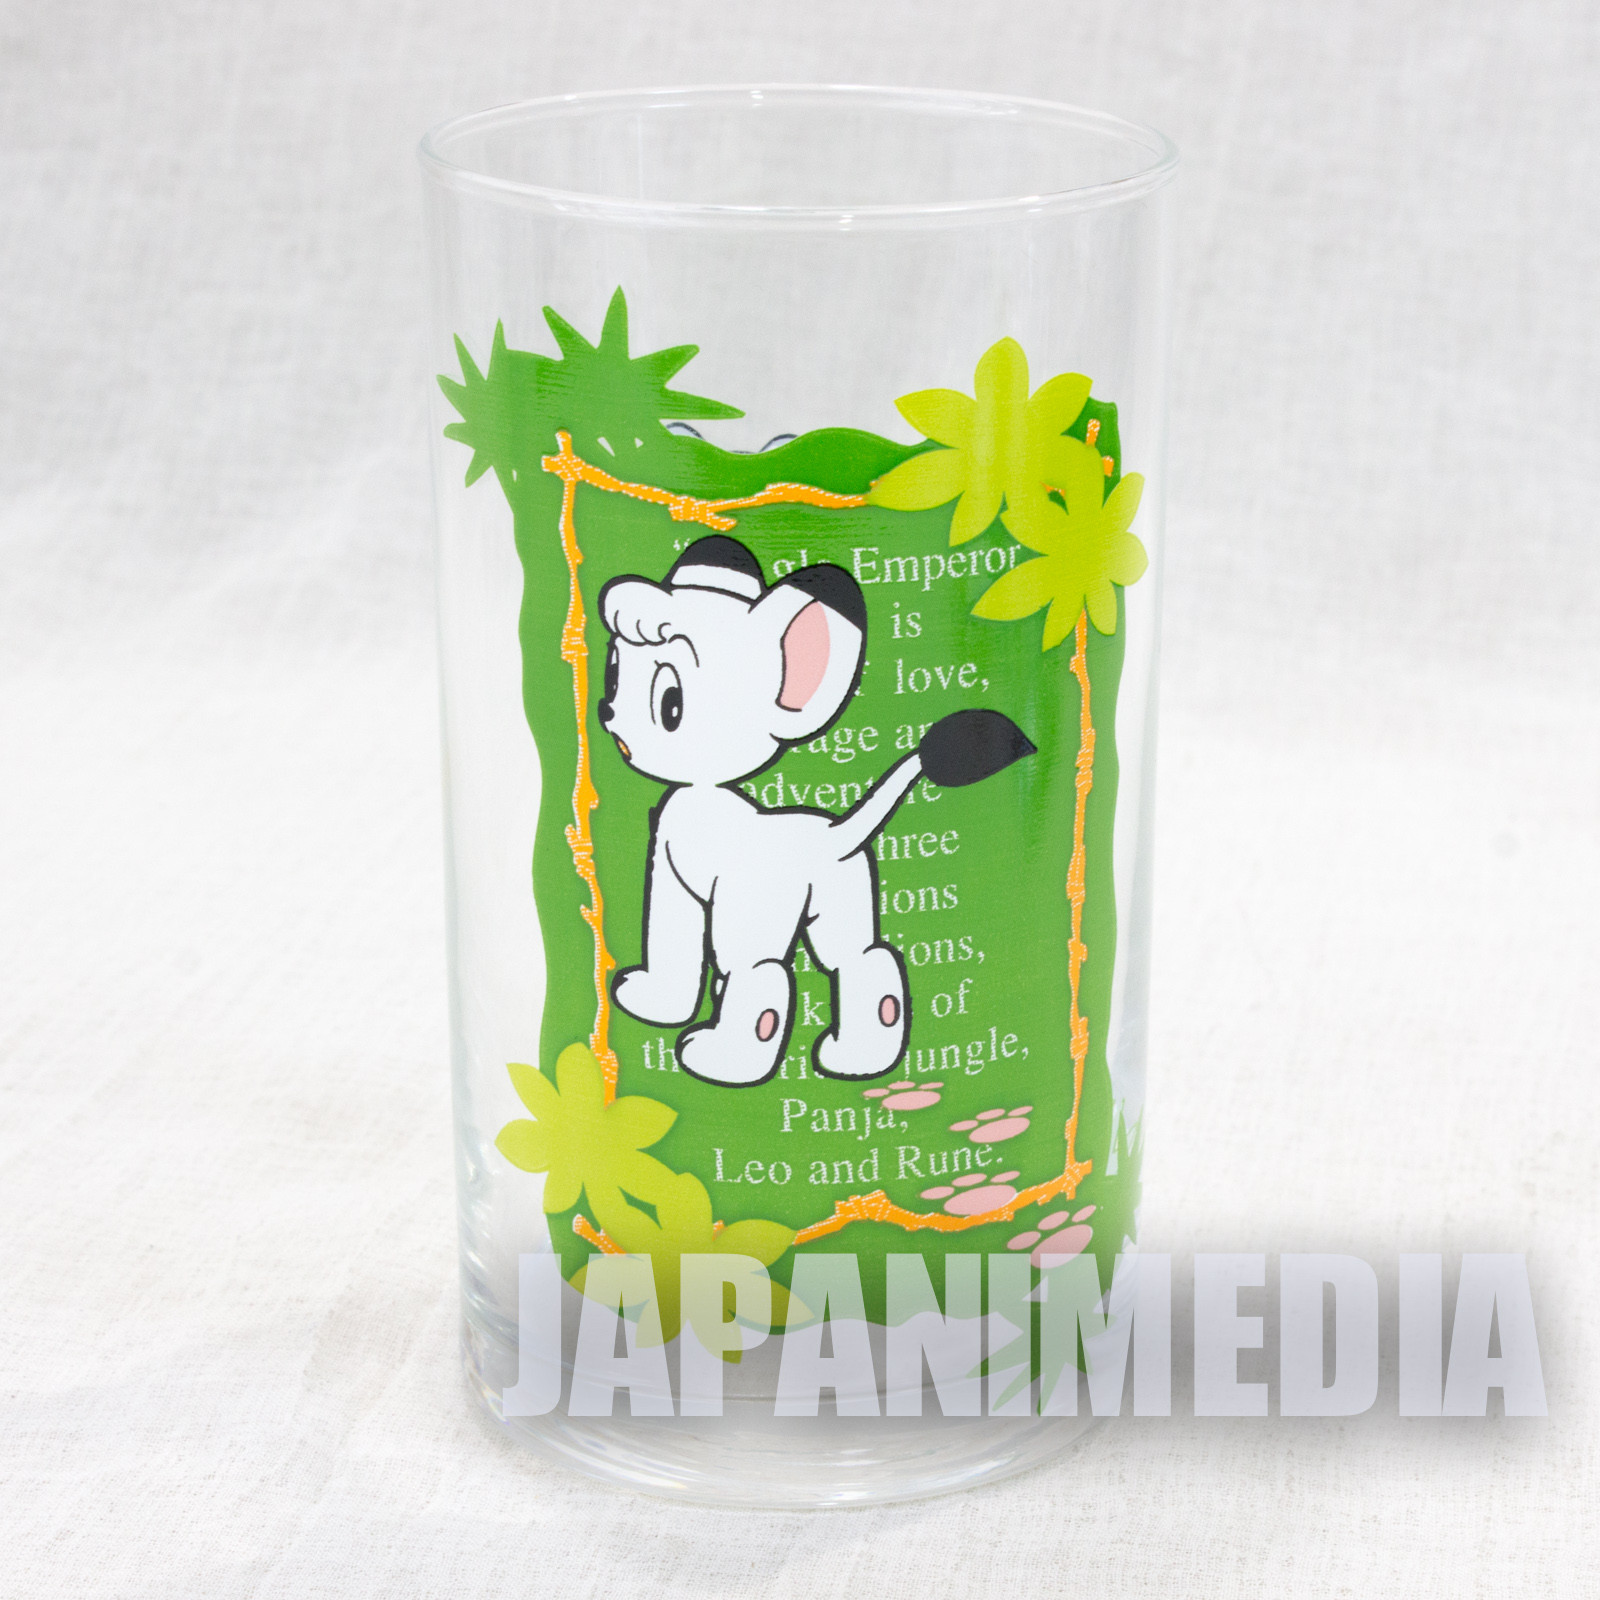 Jungle Emperor Leo Tezuka Osamu Character Glass JAPAN ANIME MANGA